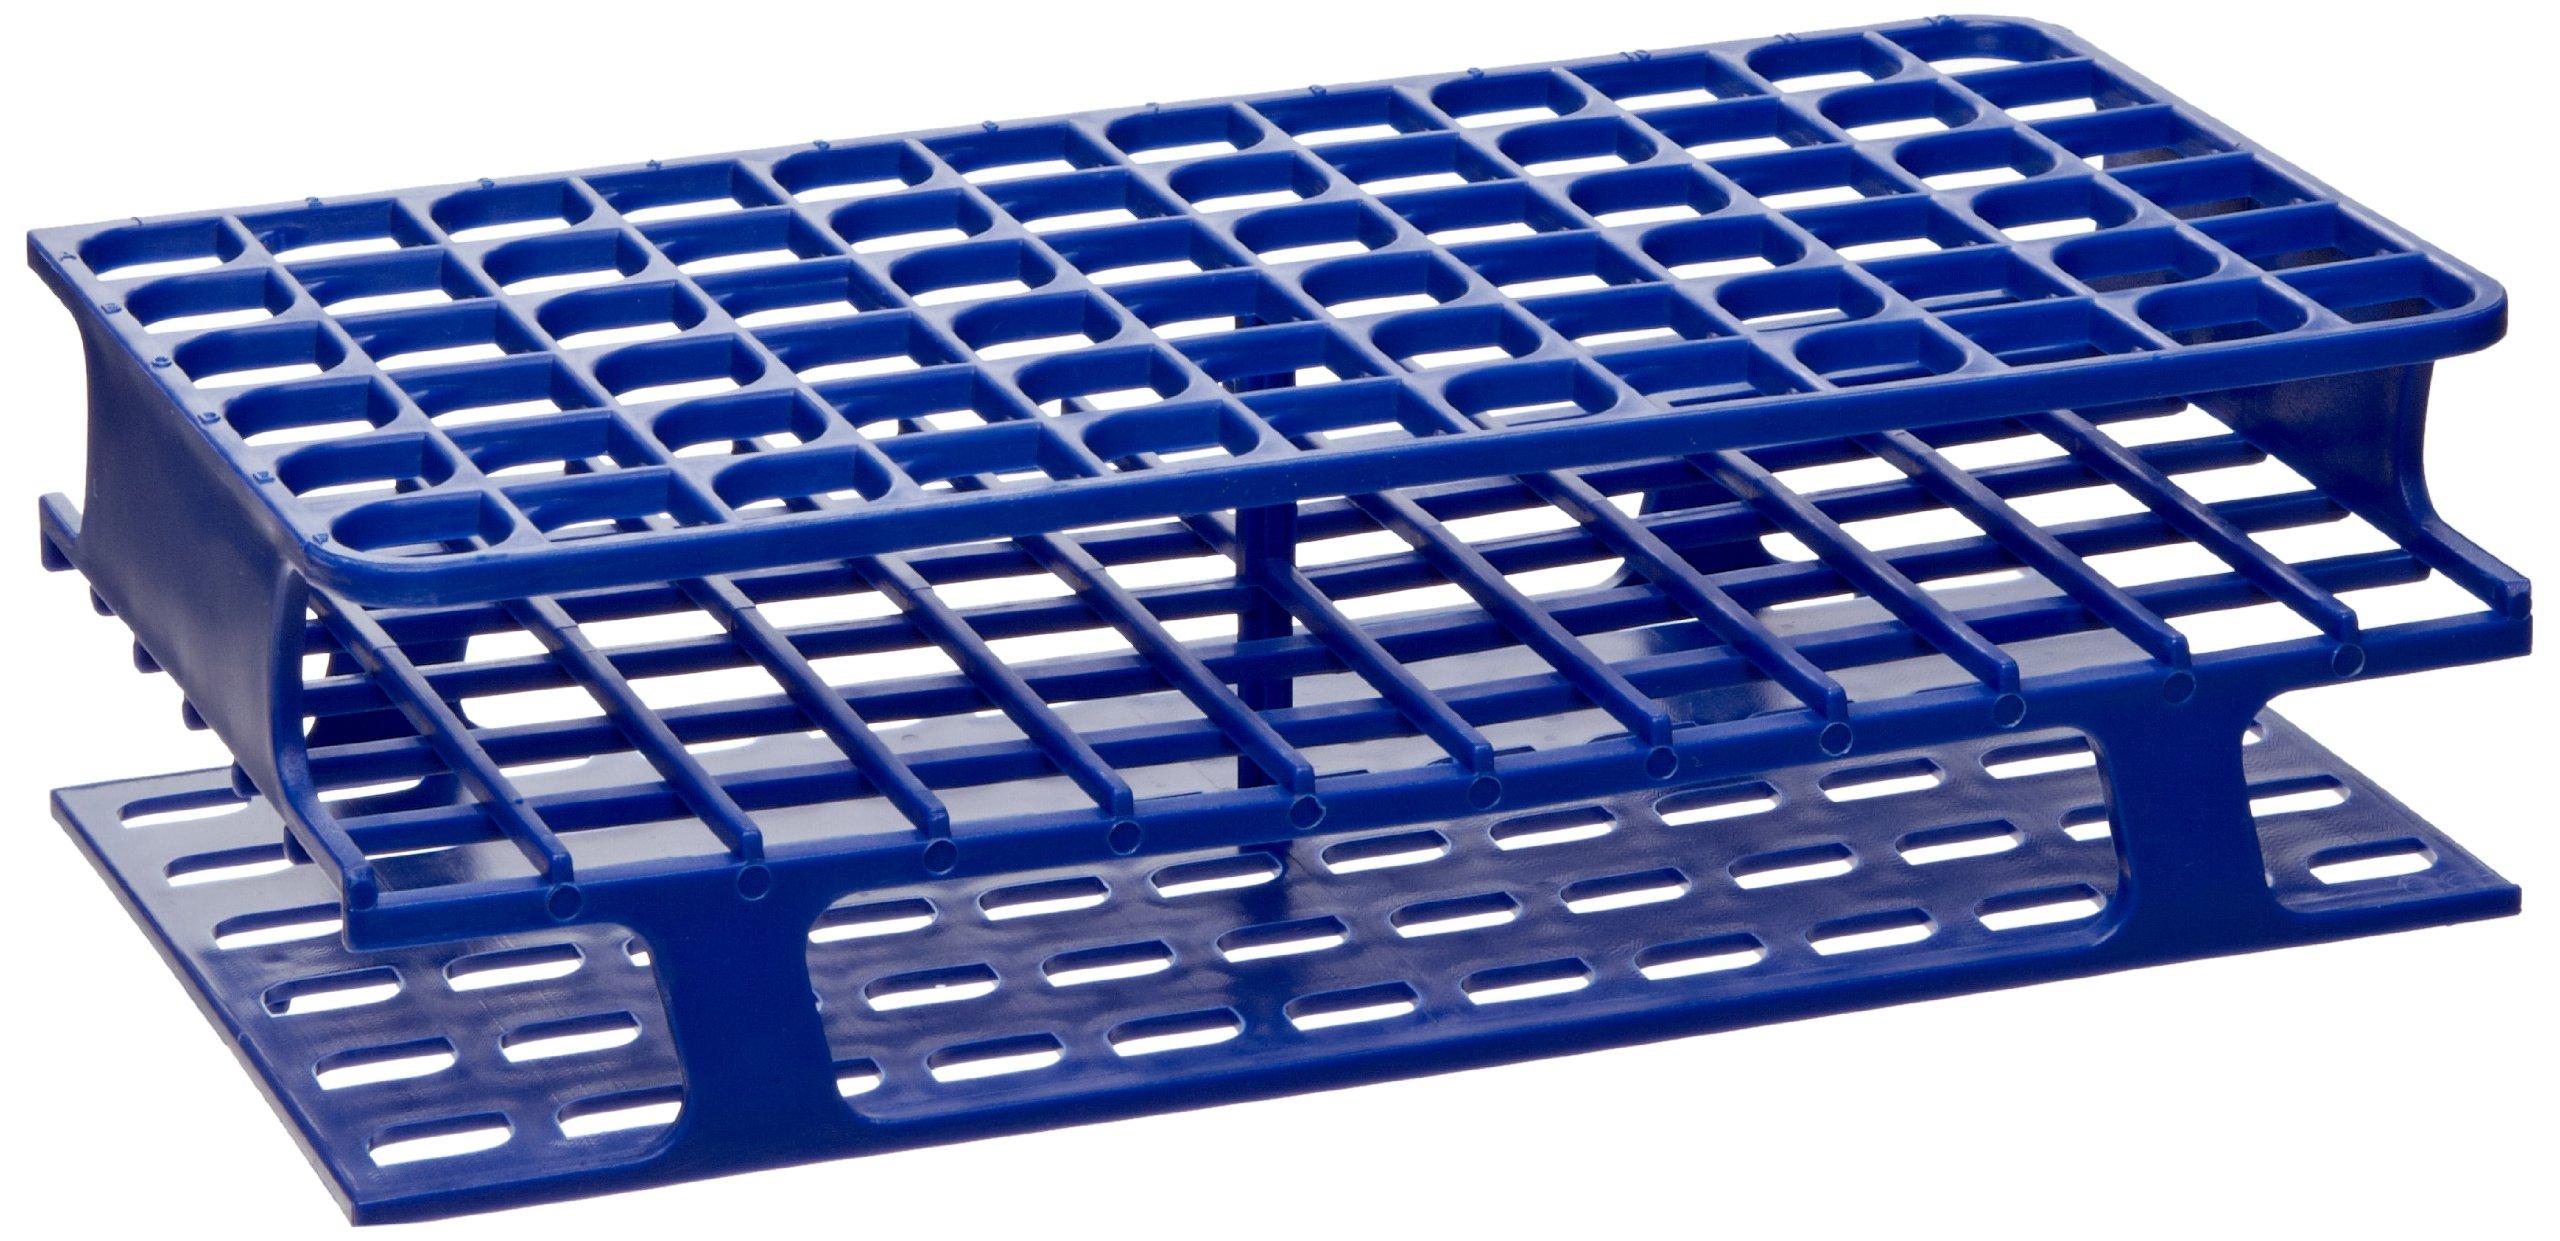 Heathrow Scientific HS27552B OneRack Tube Rack, Full Size, Polypropylene (PP), 16mm, 72 Wells, Blue (Pack of 8)